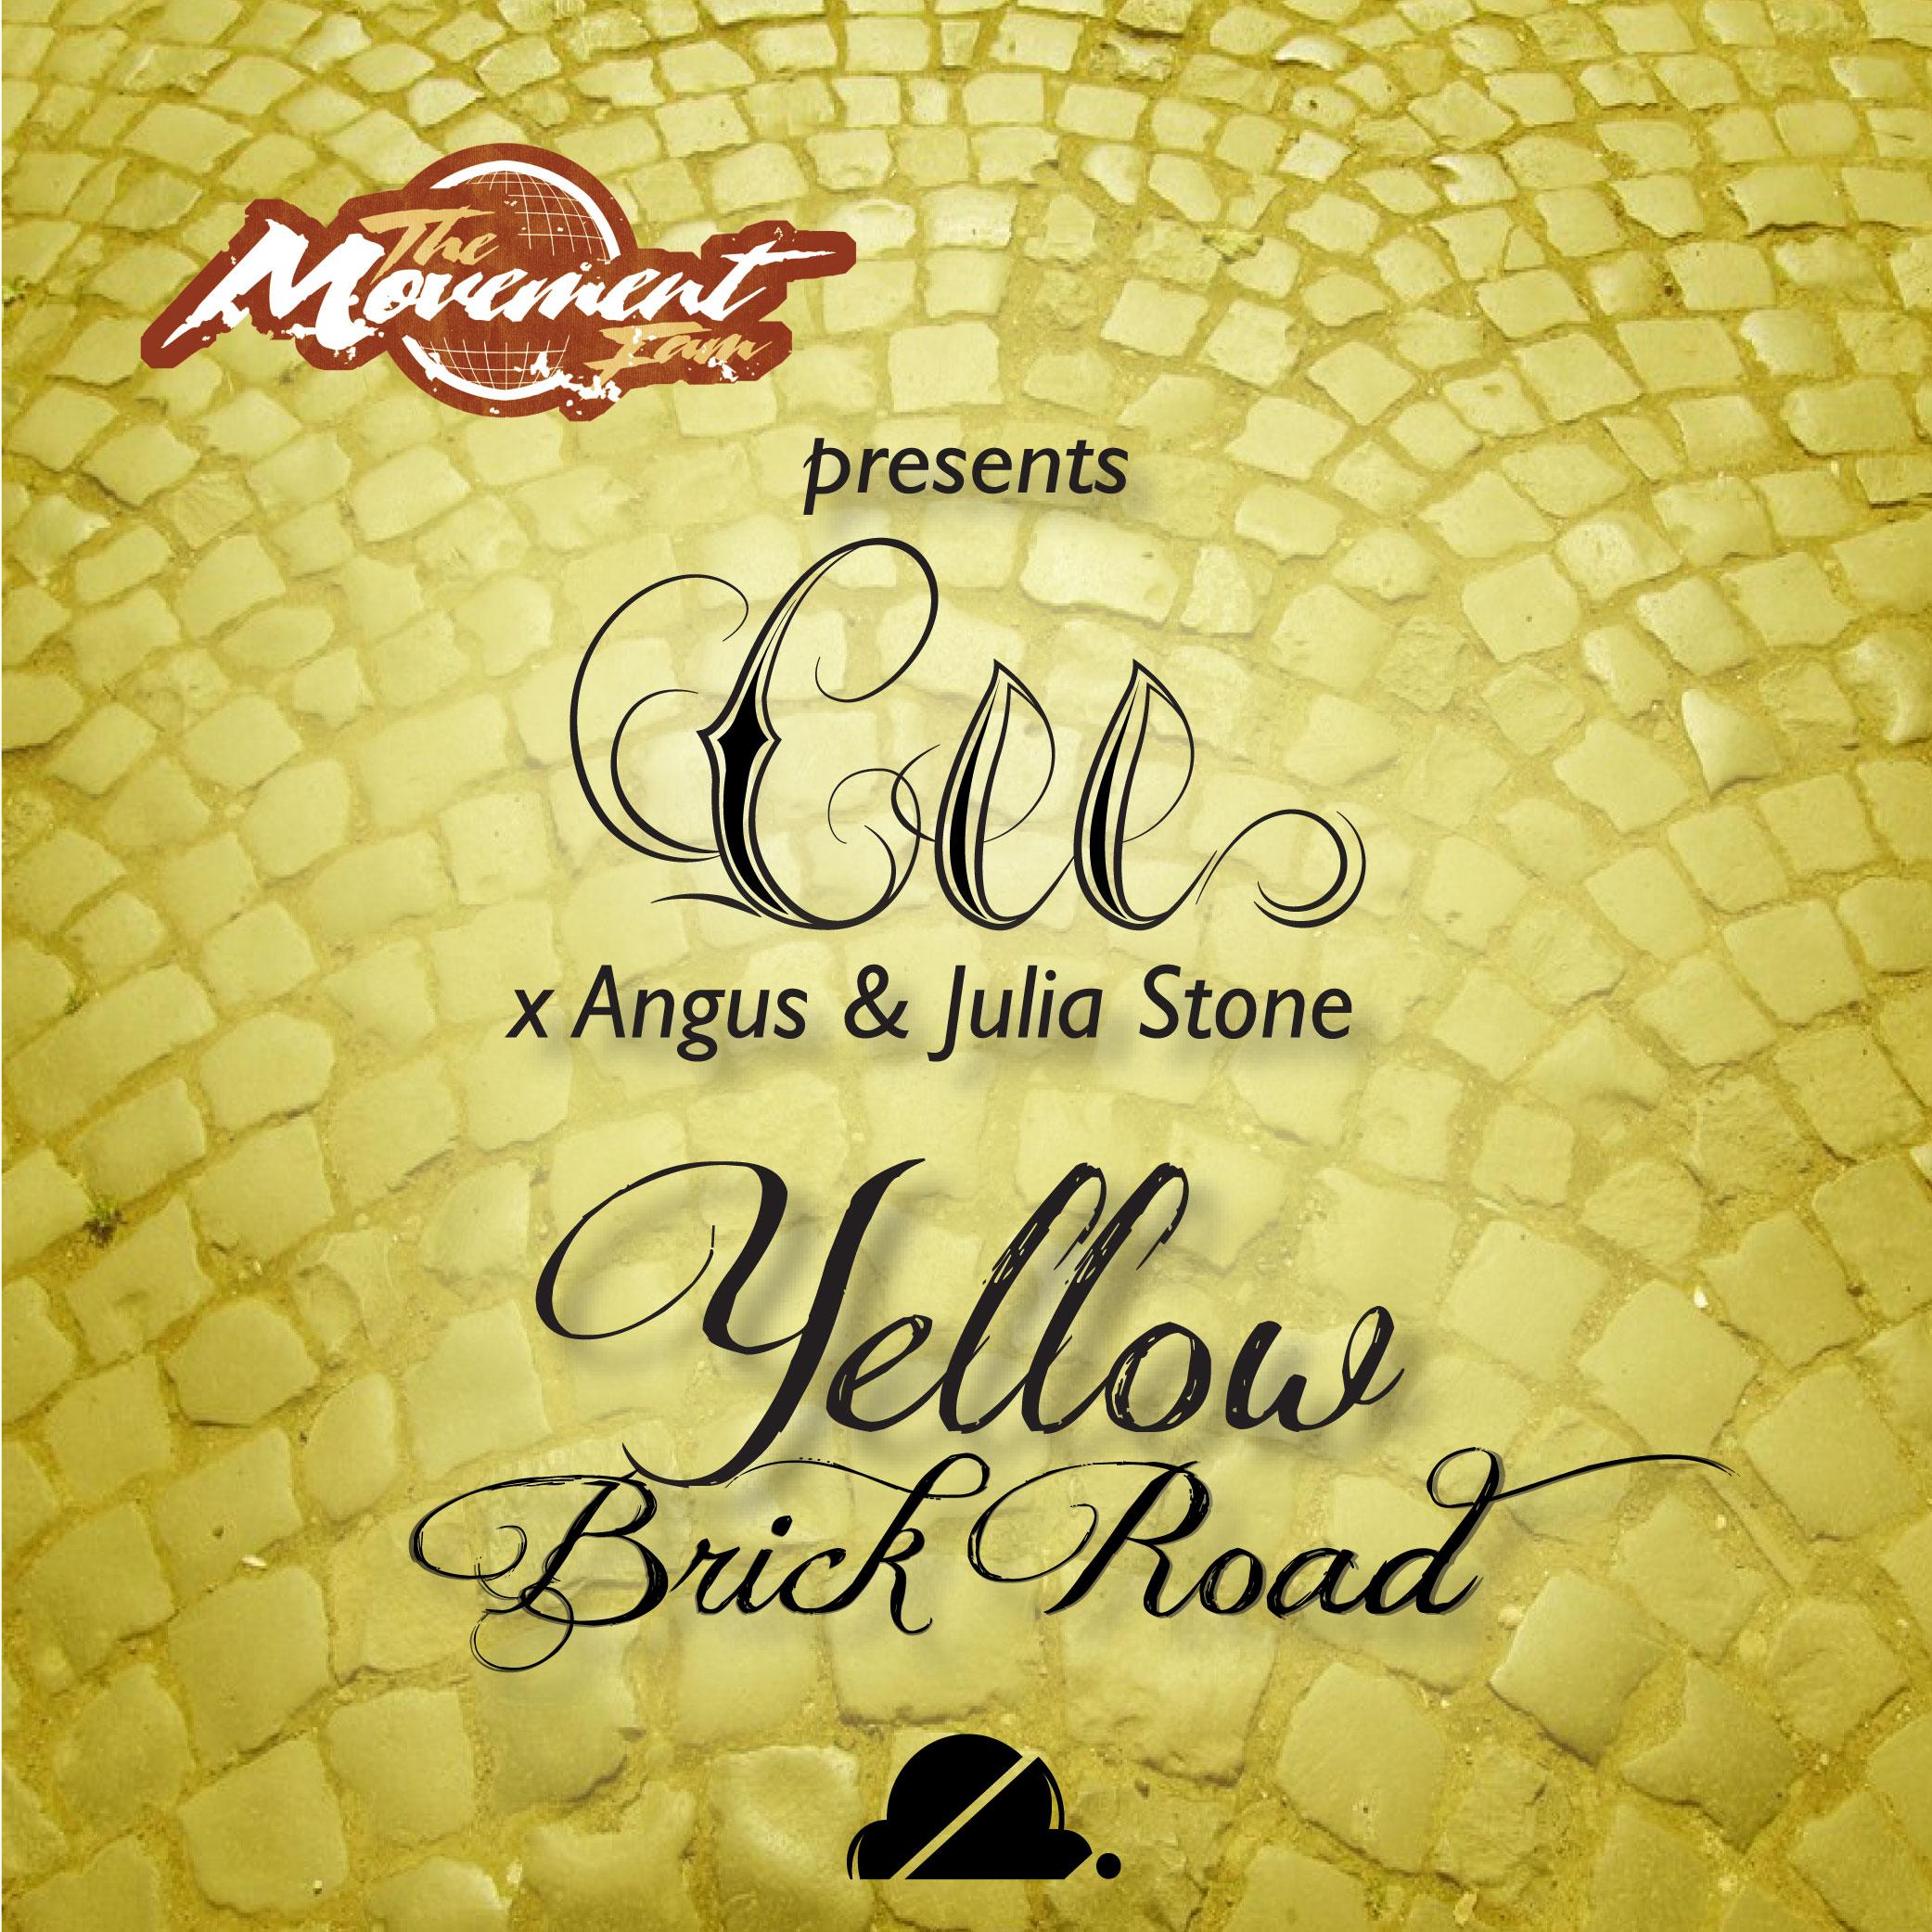 YellowBrickRoad-FULL.jpg